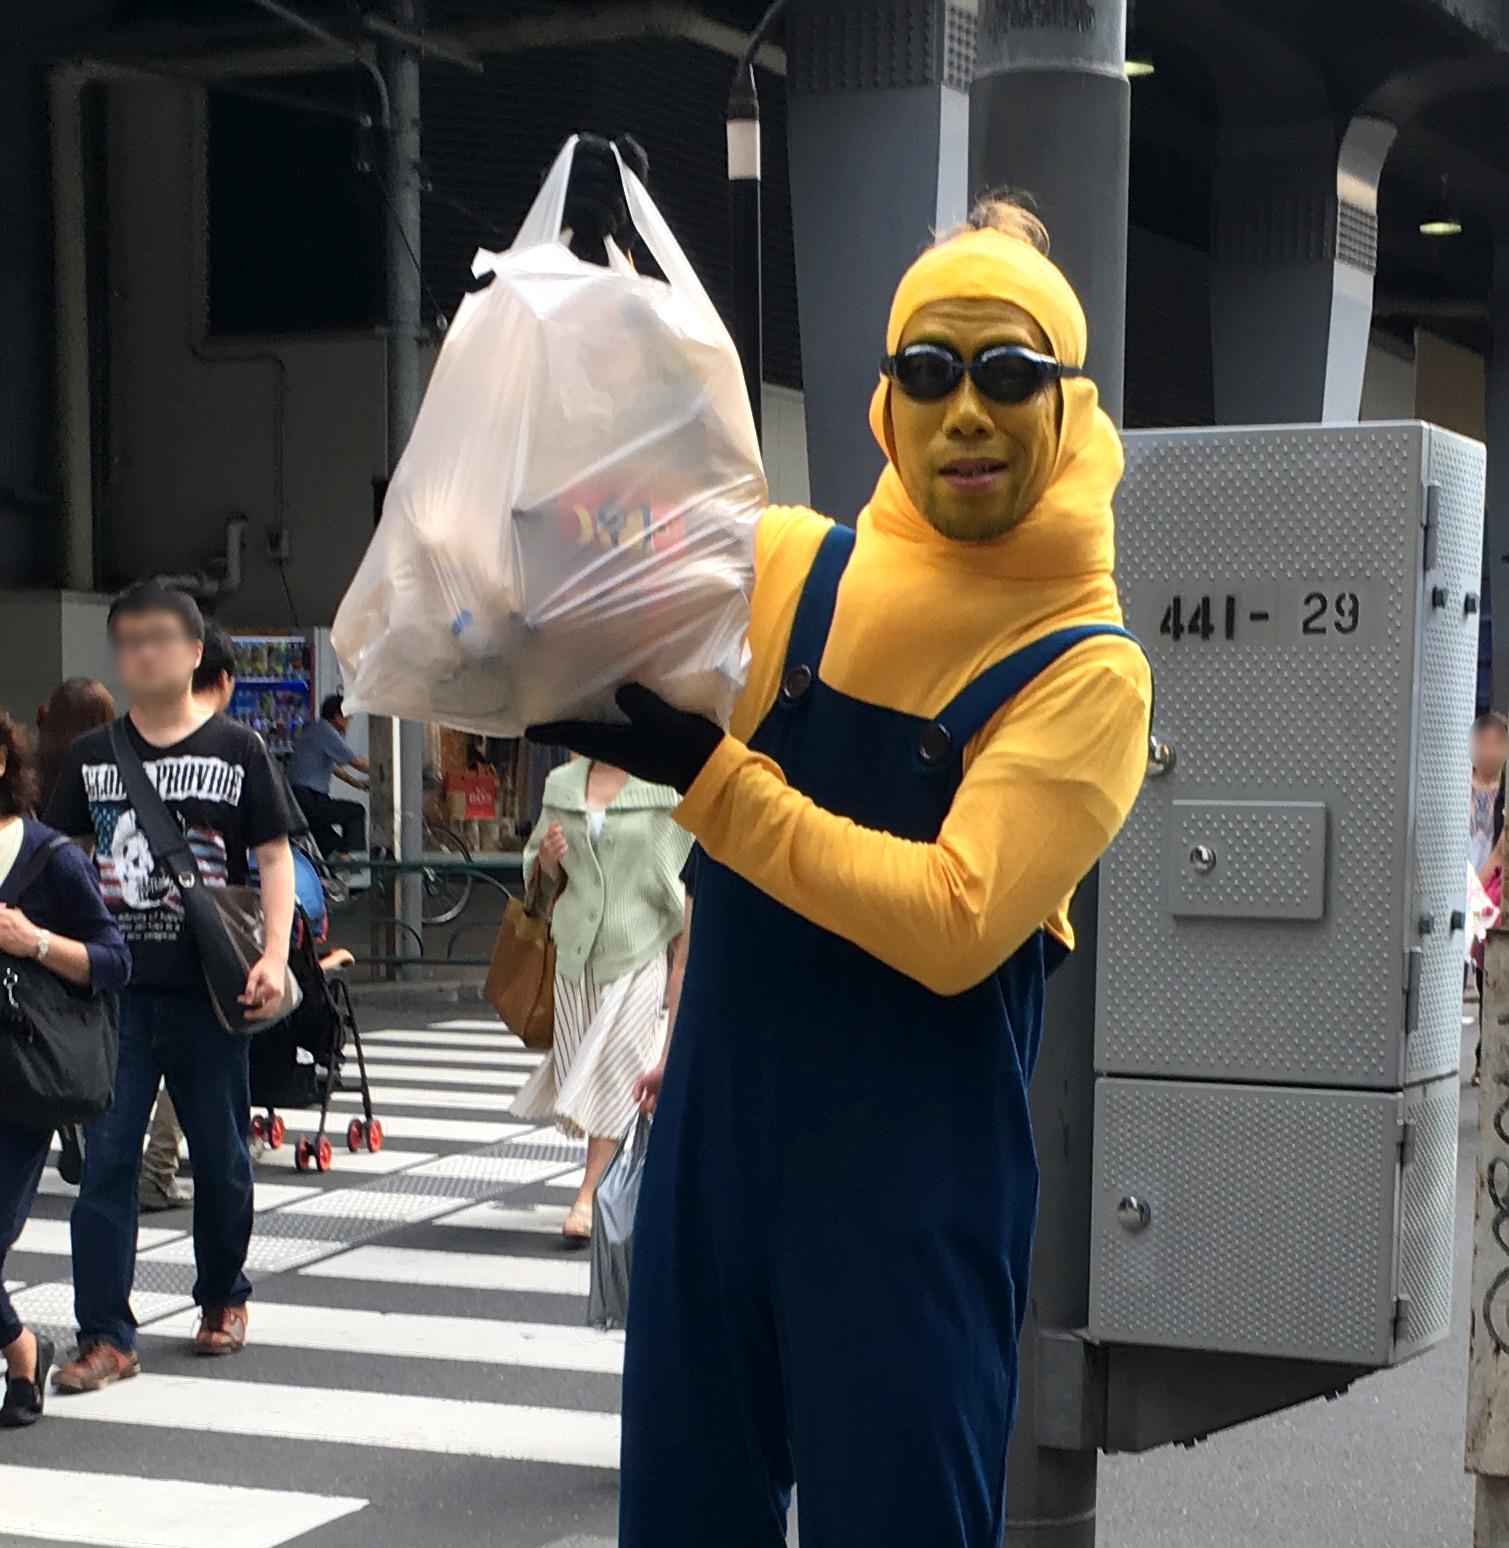 bananam17